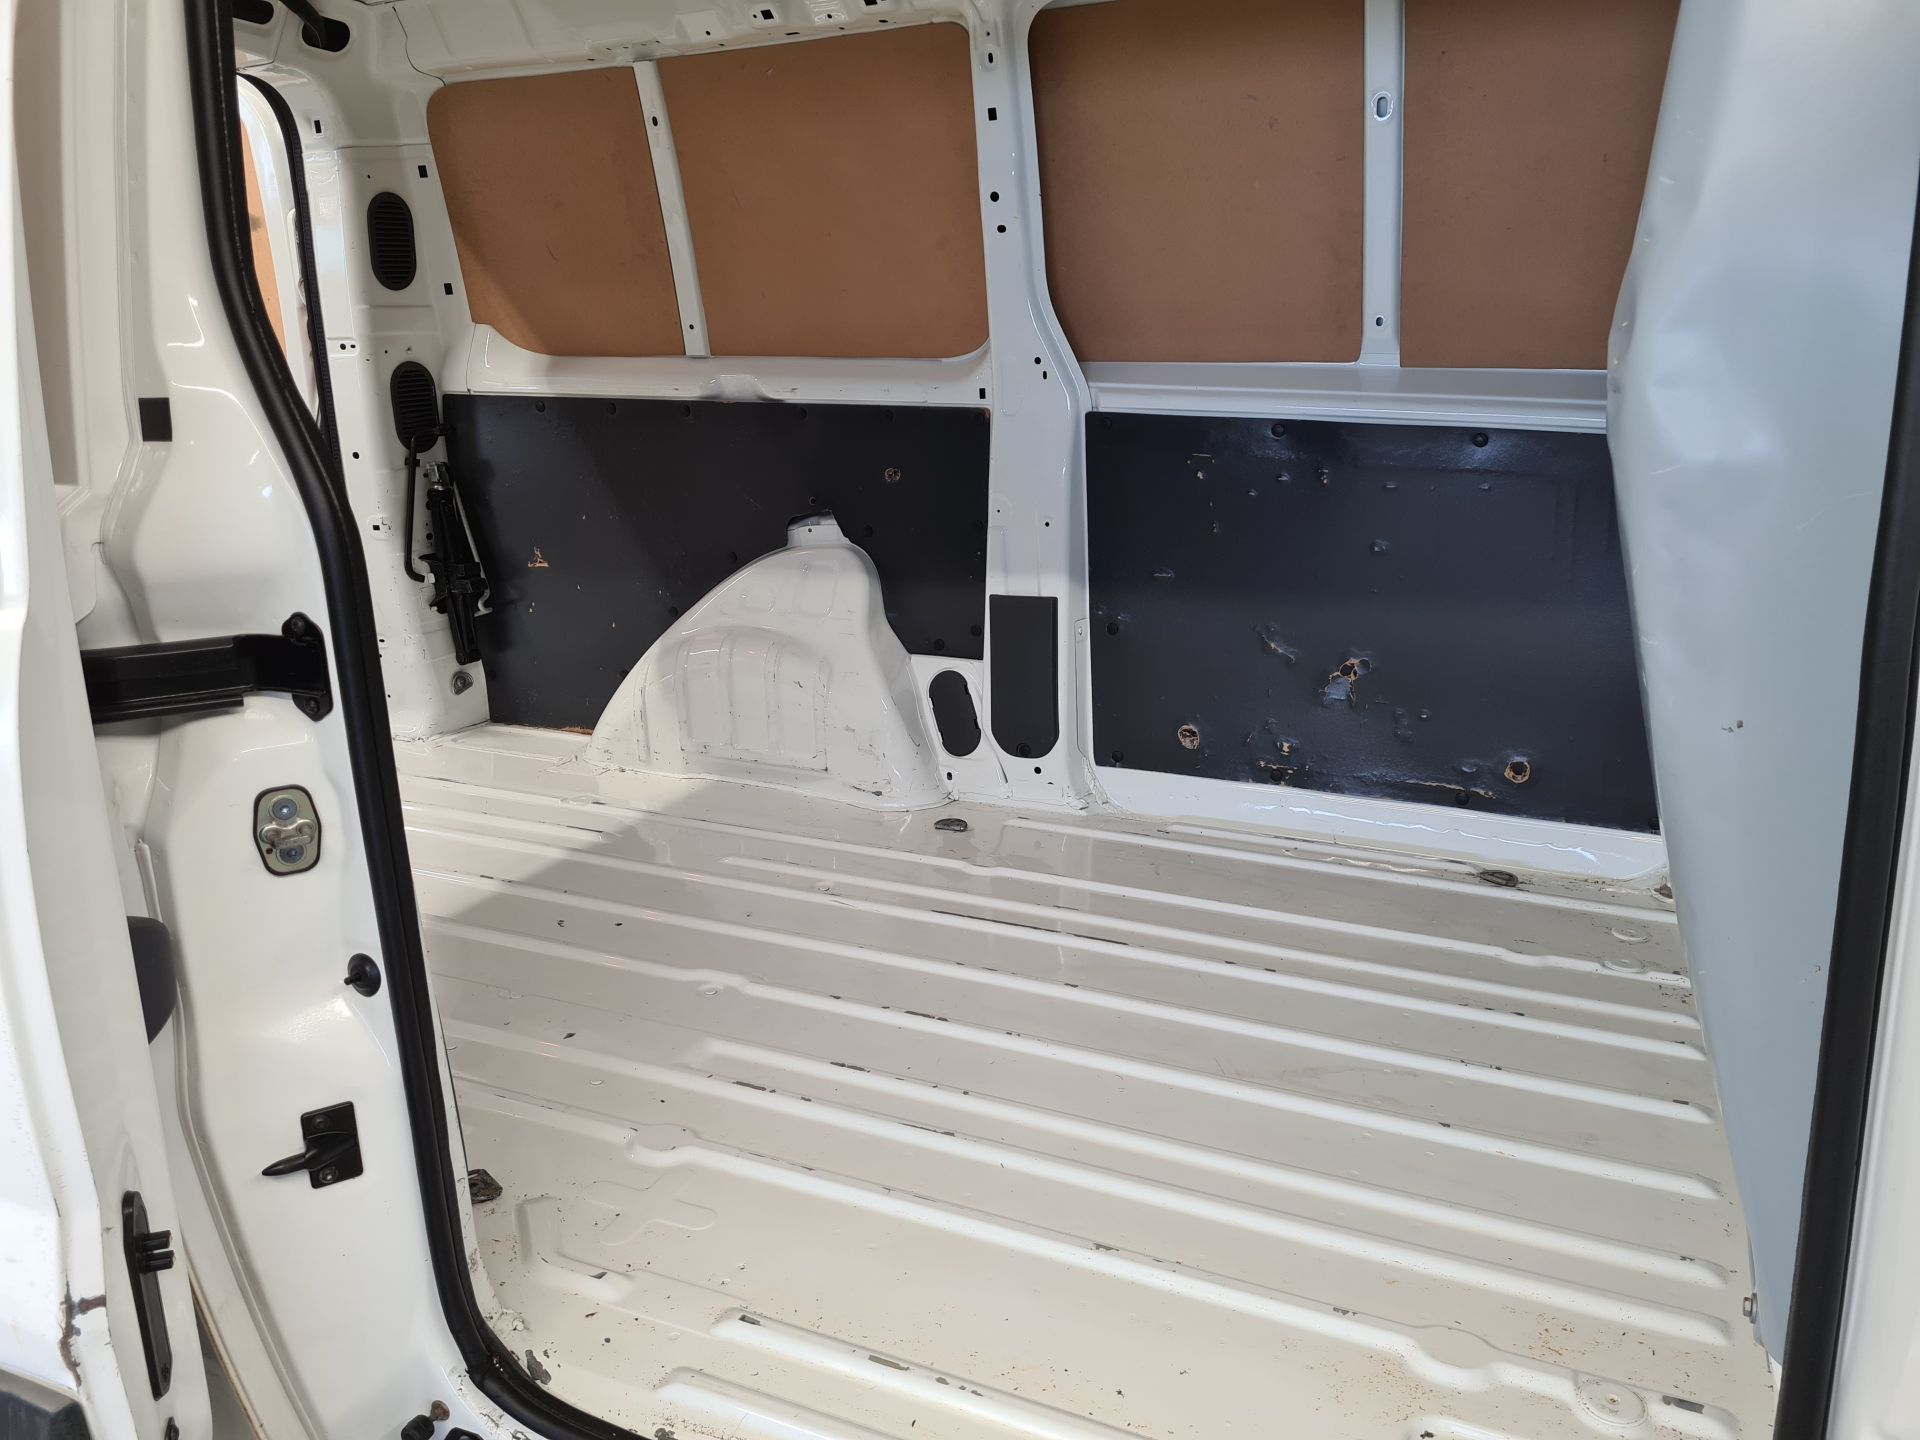 Fiat Scudo 2.0 MJT 130cv 10 Standard Corto 5/6 N1